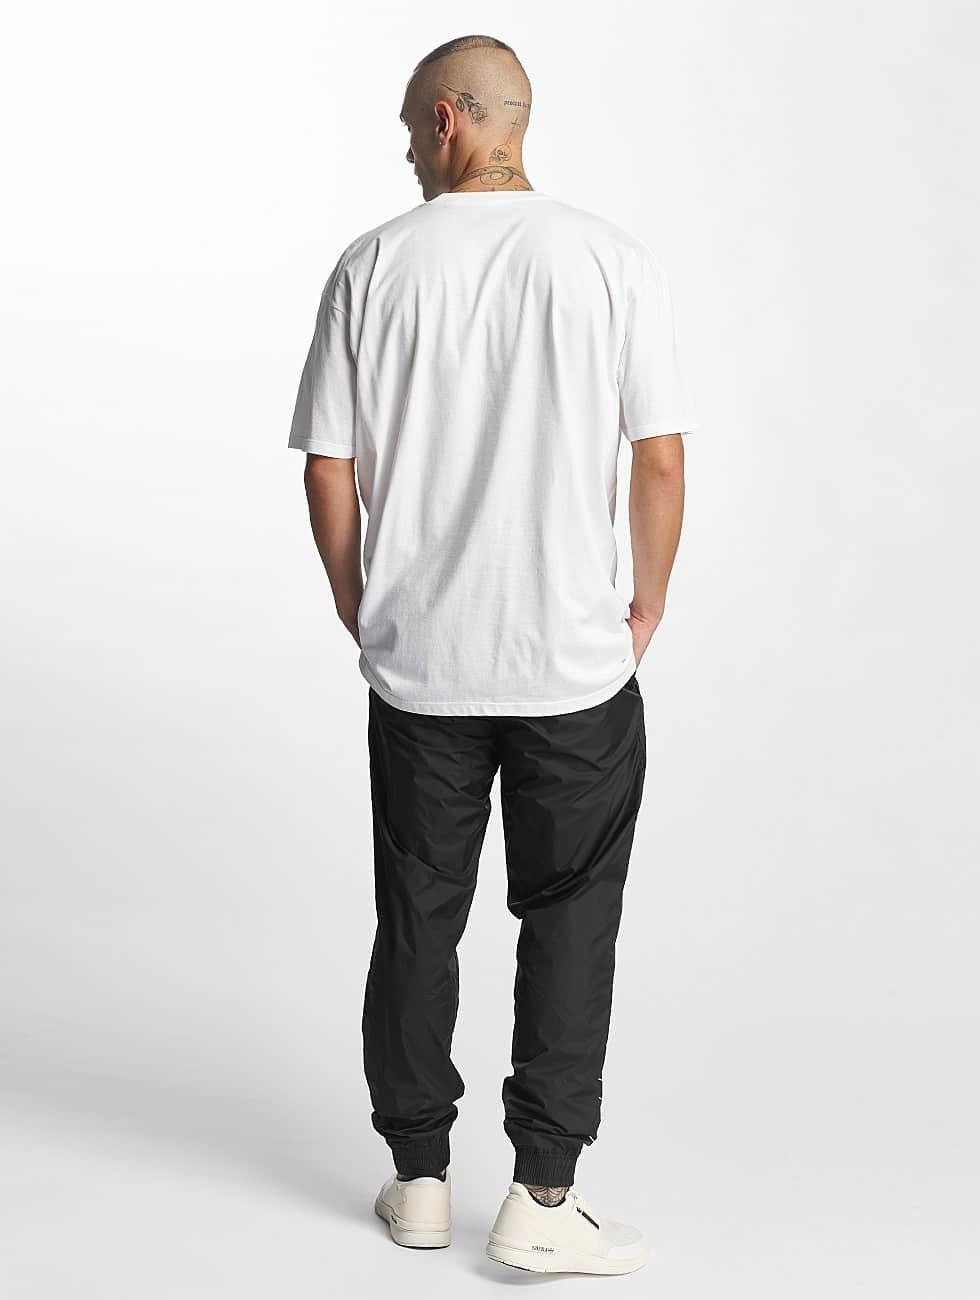 Supra T-Shirt Heritage weiß